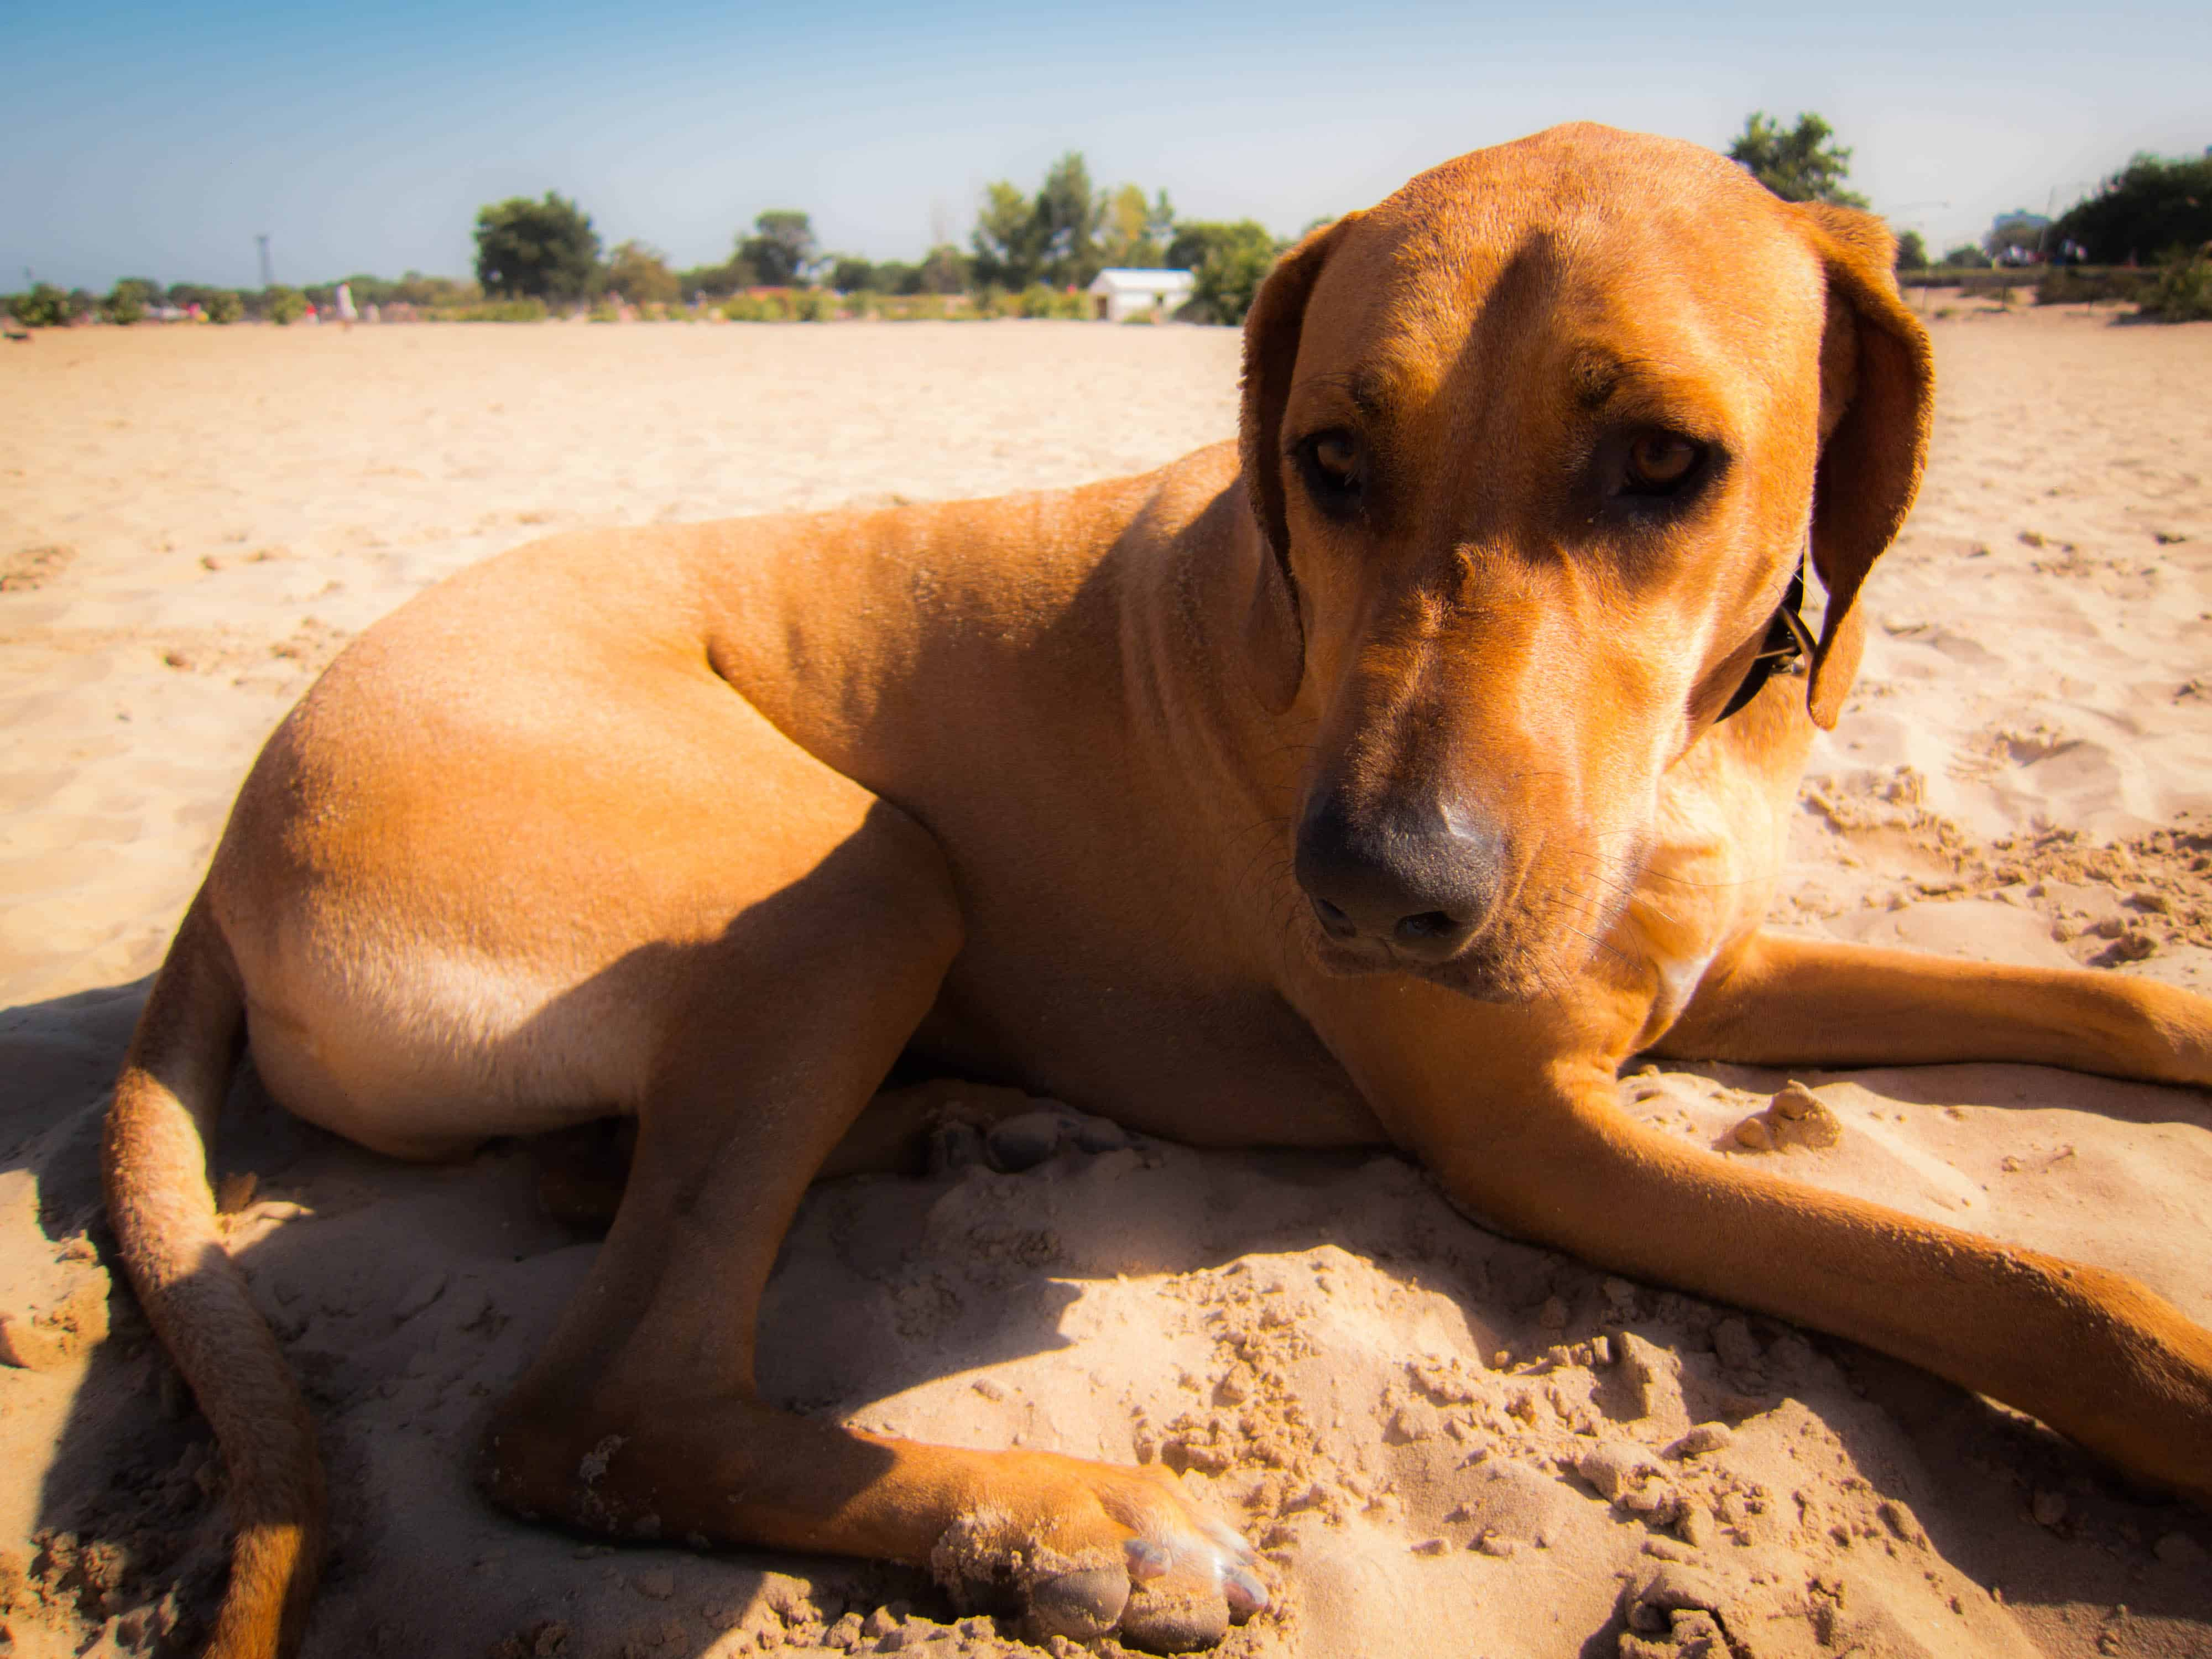 Rhodesian Ridgeback, dog adventure, Rhodesian Ridgeback photos, traveling with your dog, dog beach, dog park